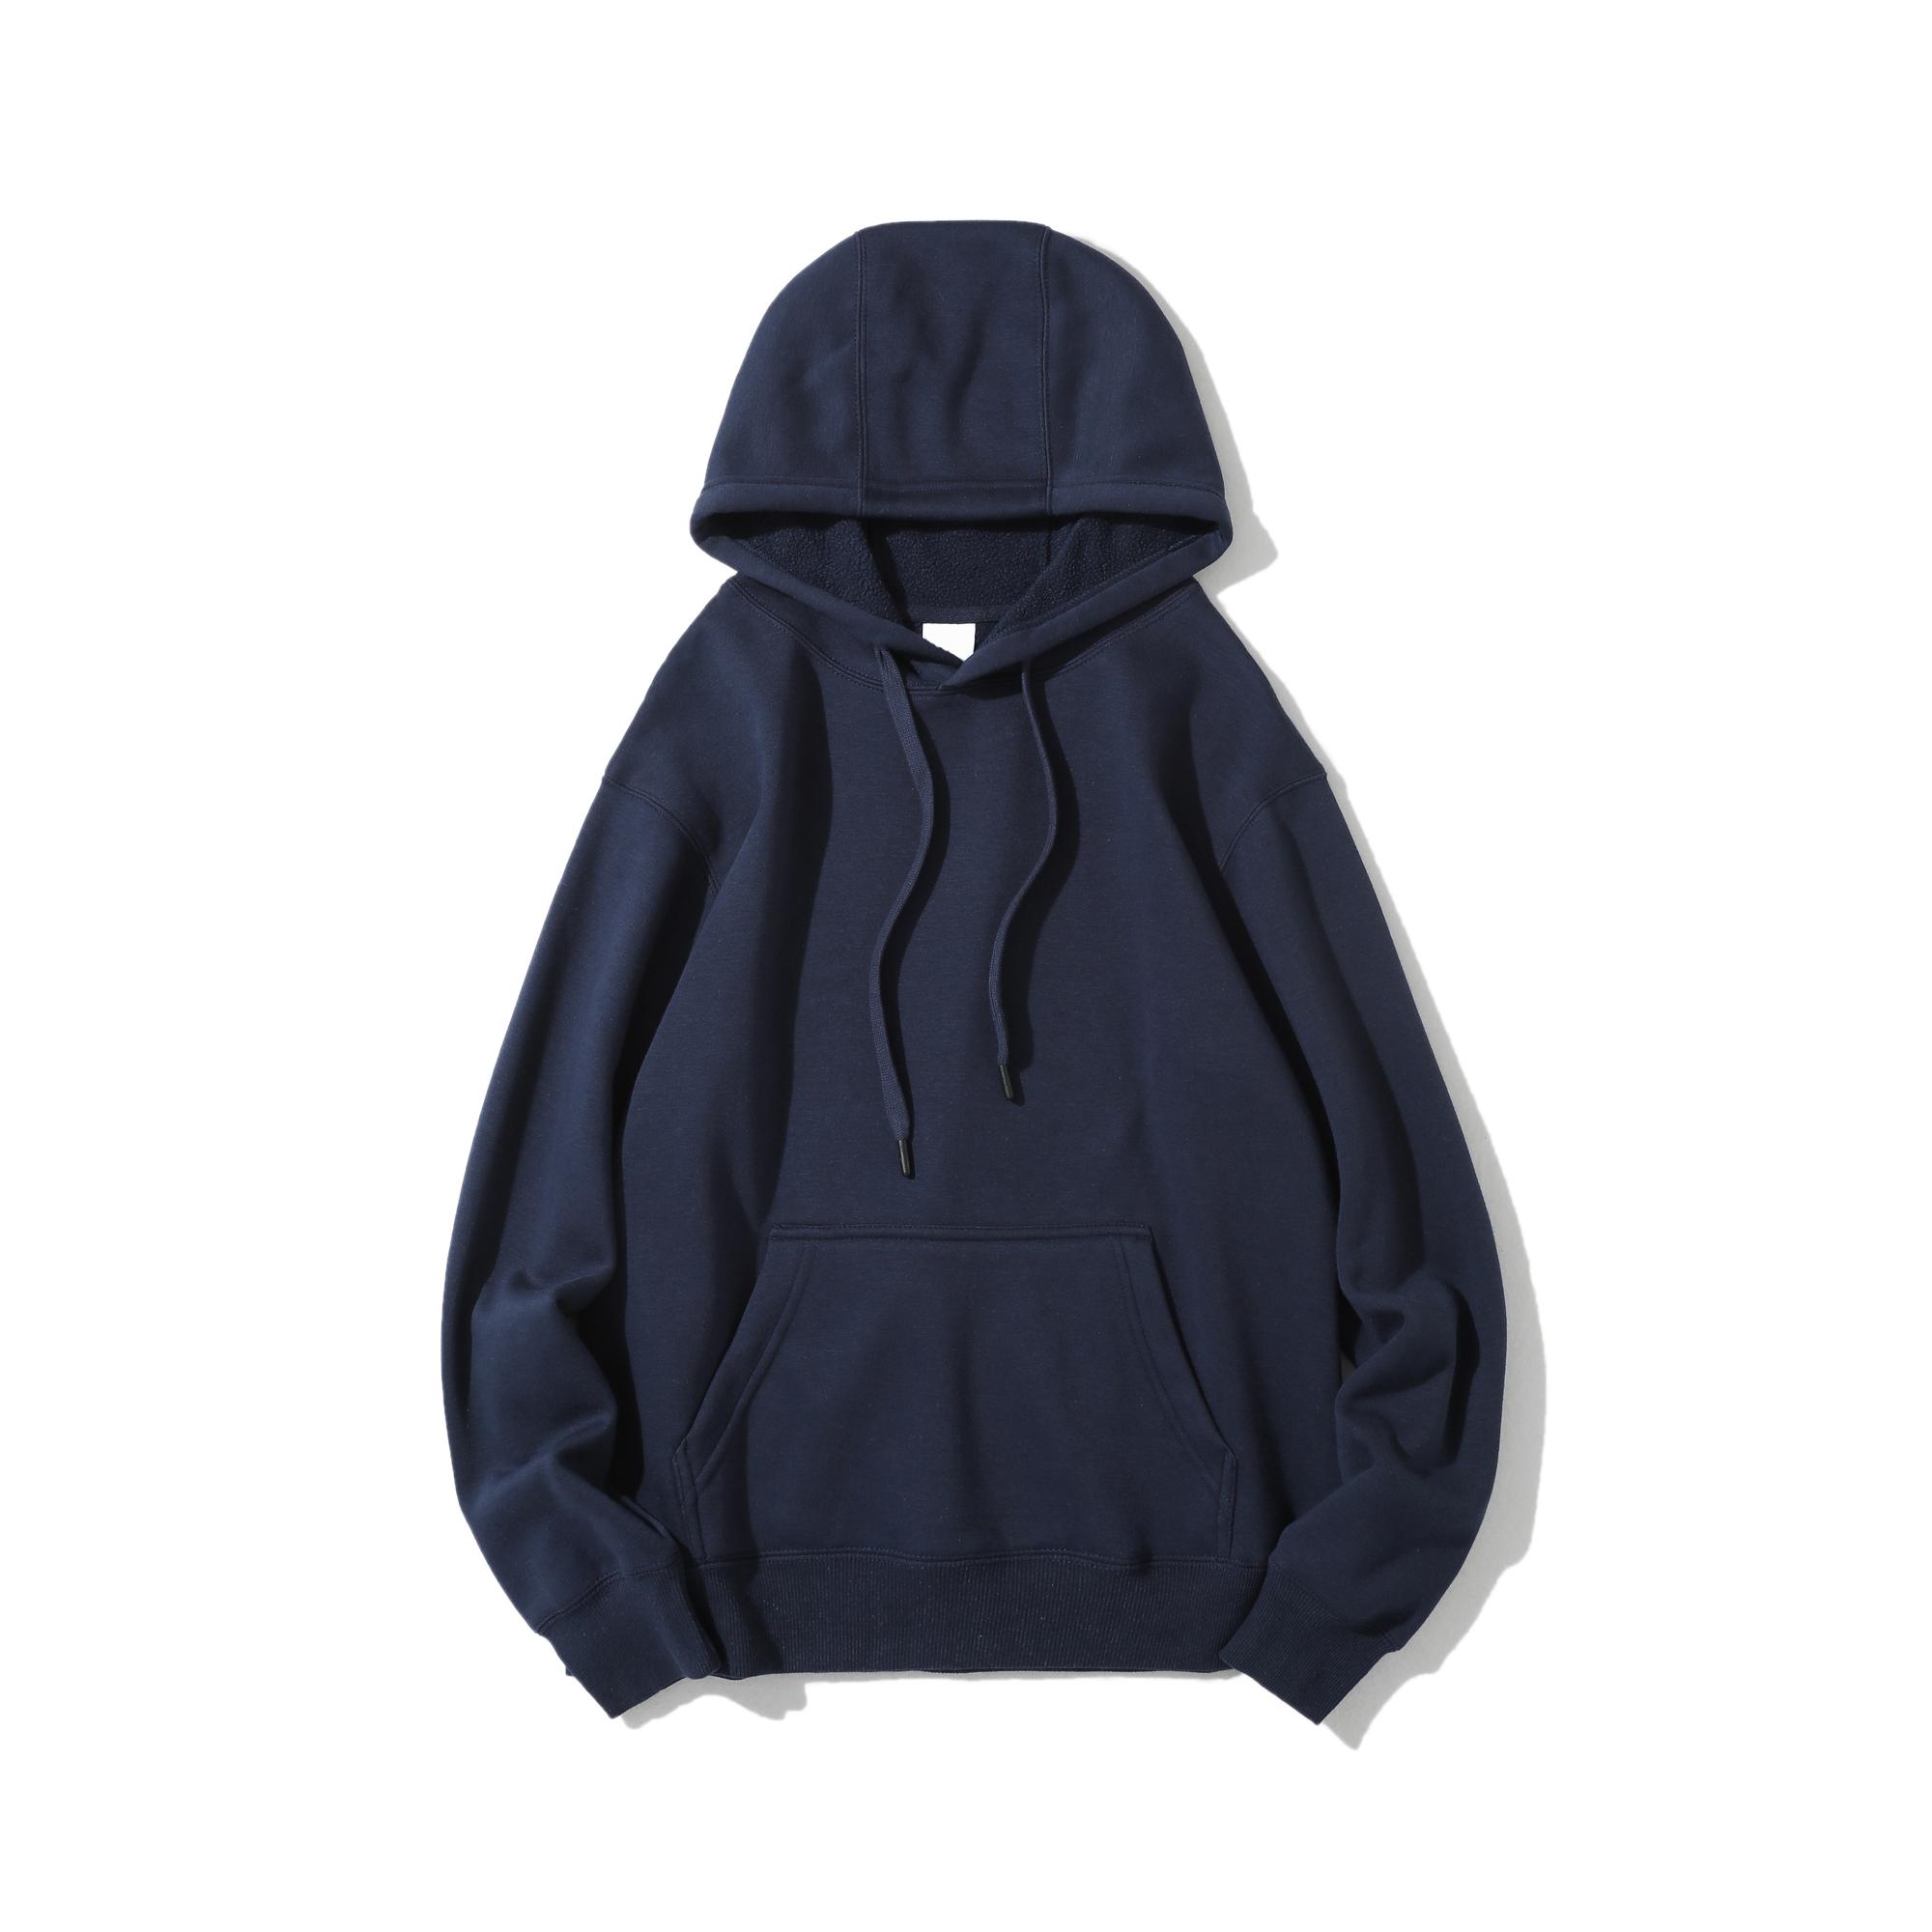 Hoodies Unisex Plain Sweatshirt Print Winter Pullover Cotton Sprint Custom Logo Men Sweatshirt